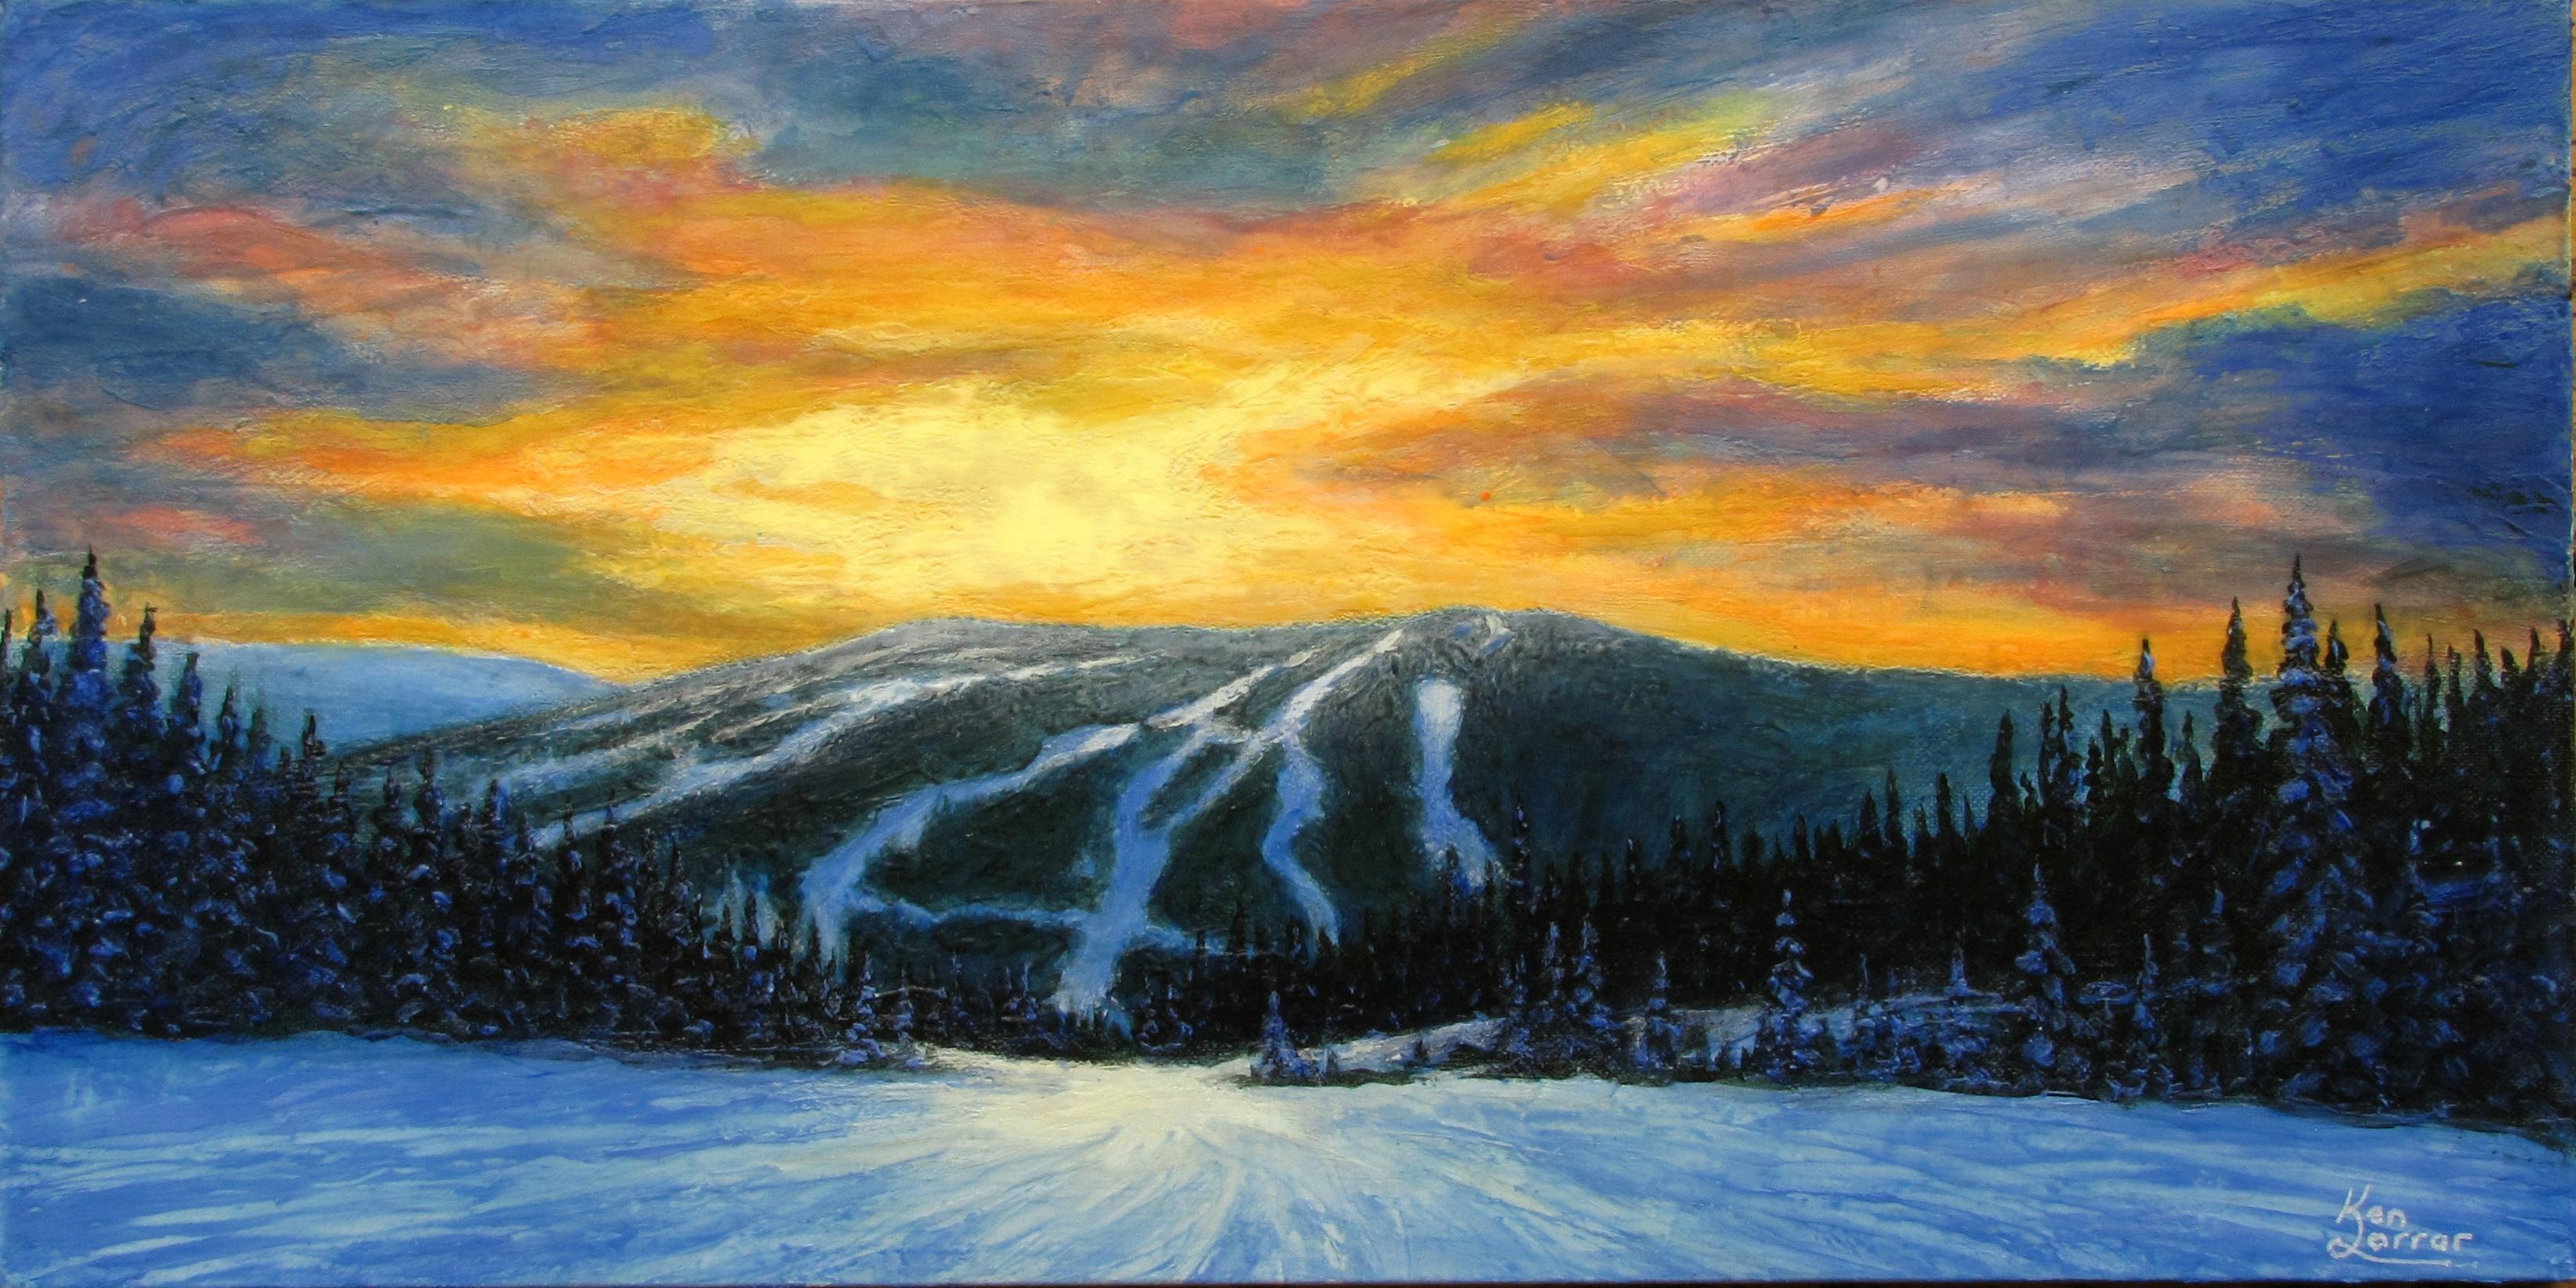 Magic In The Sky - Sun Peaks